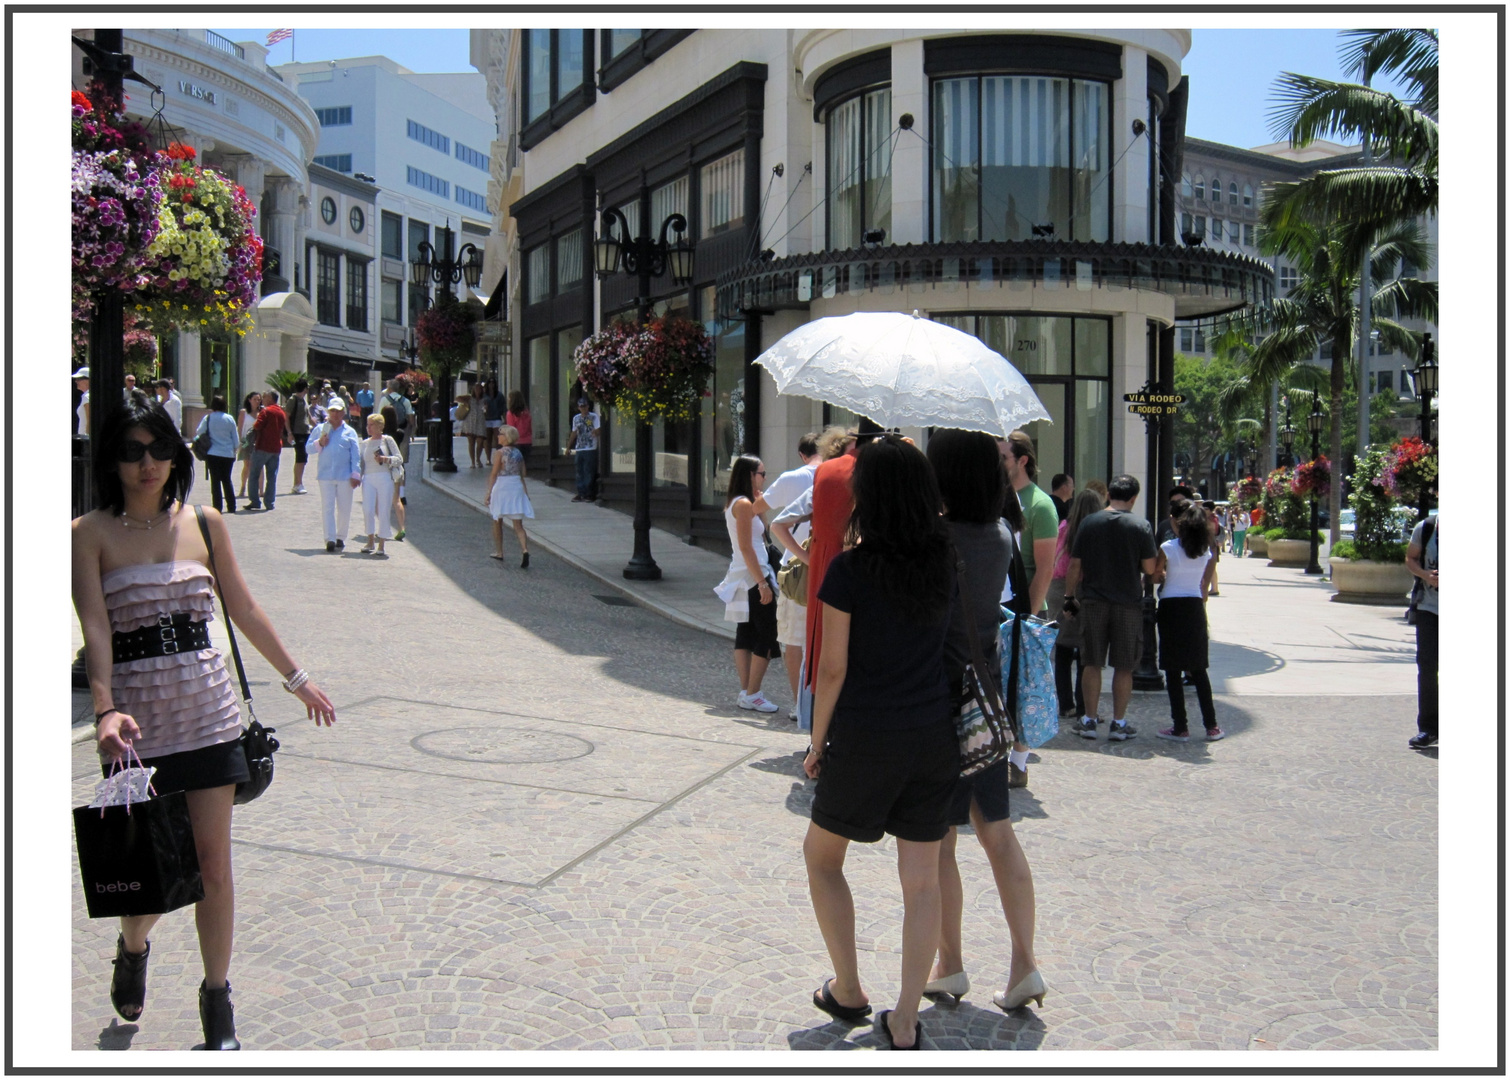 Shoppen in Beverly Hills